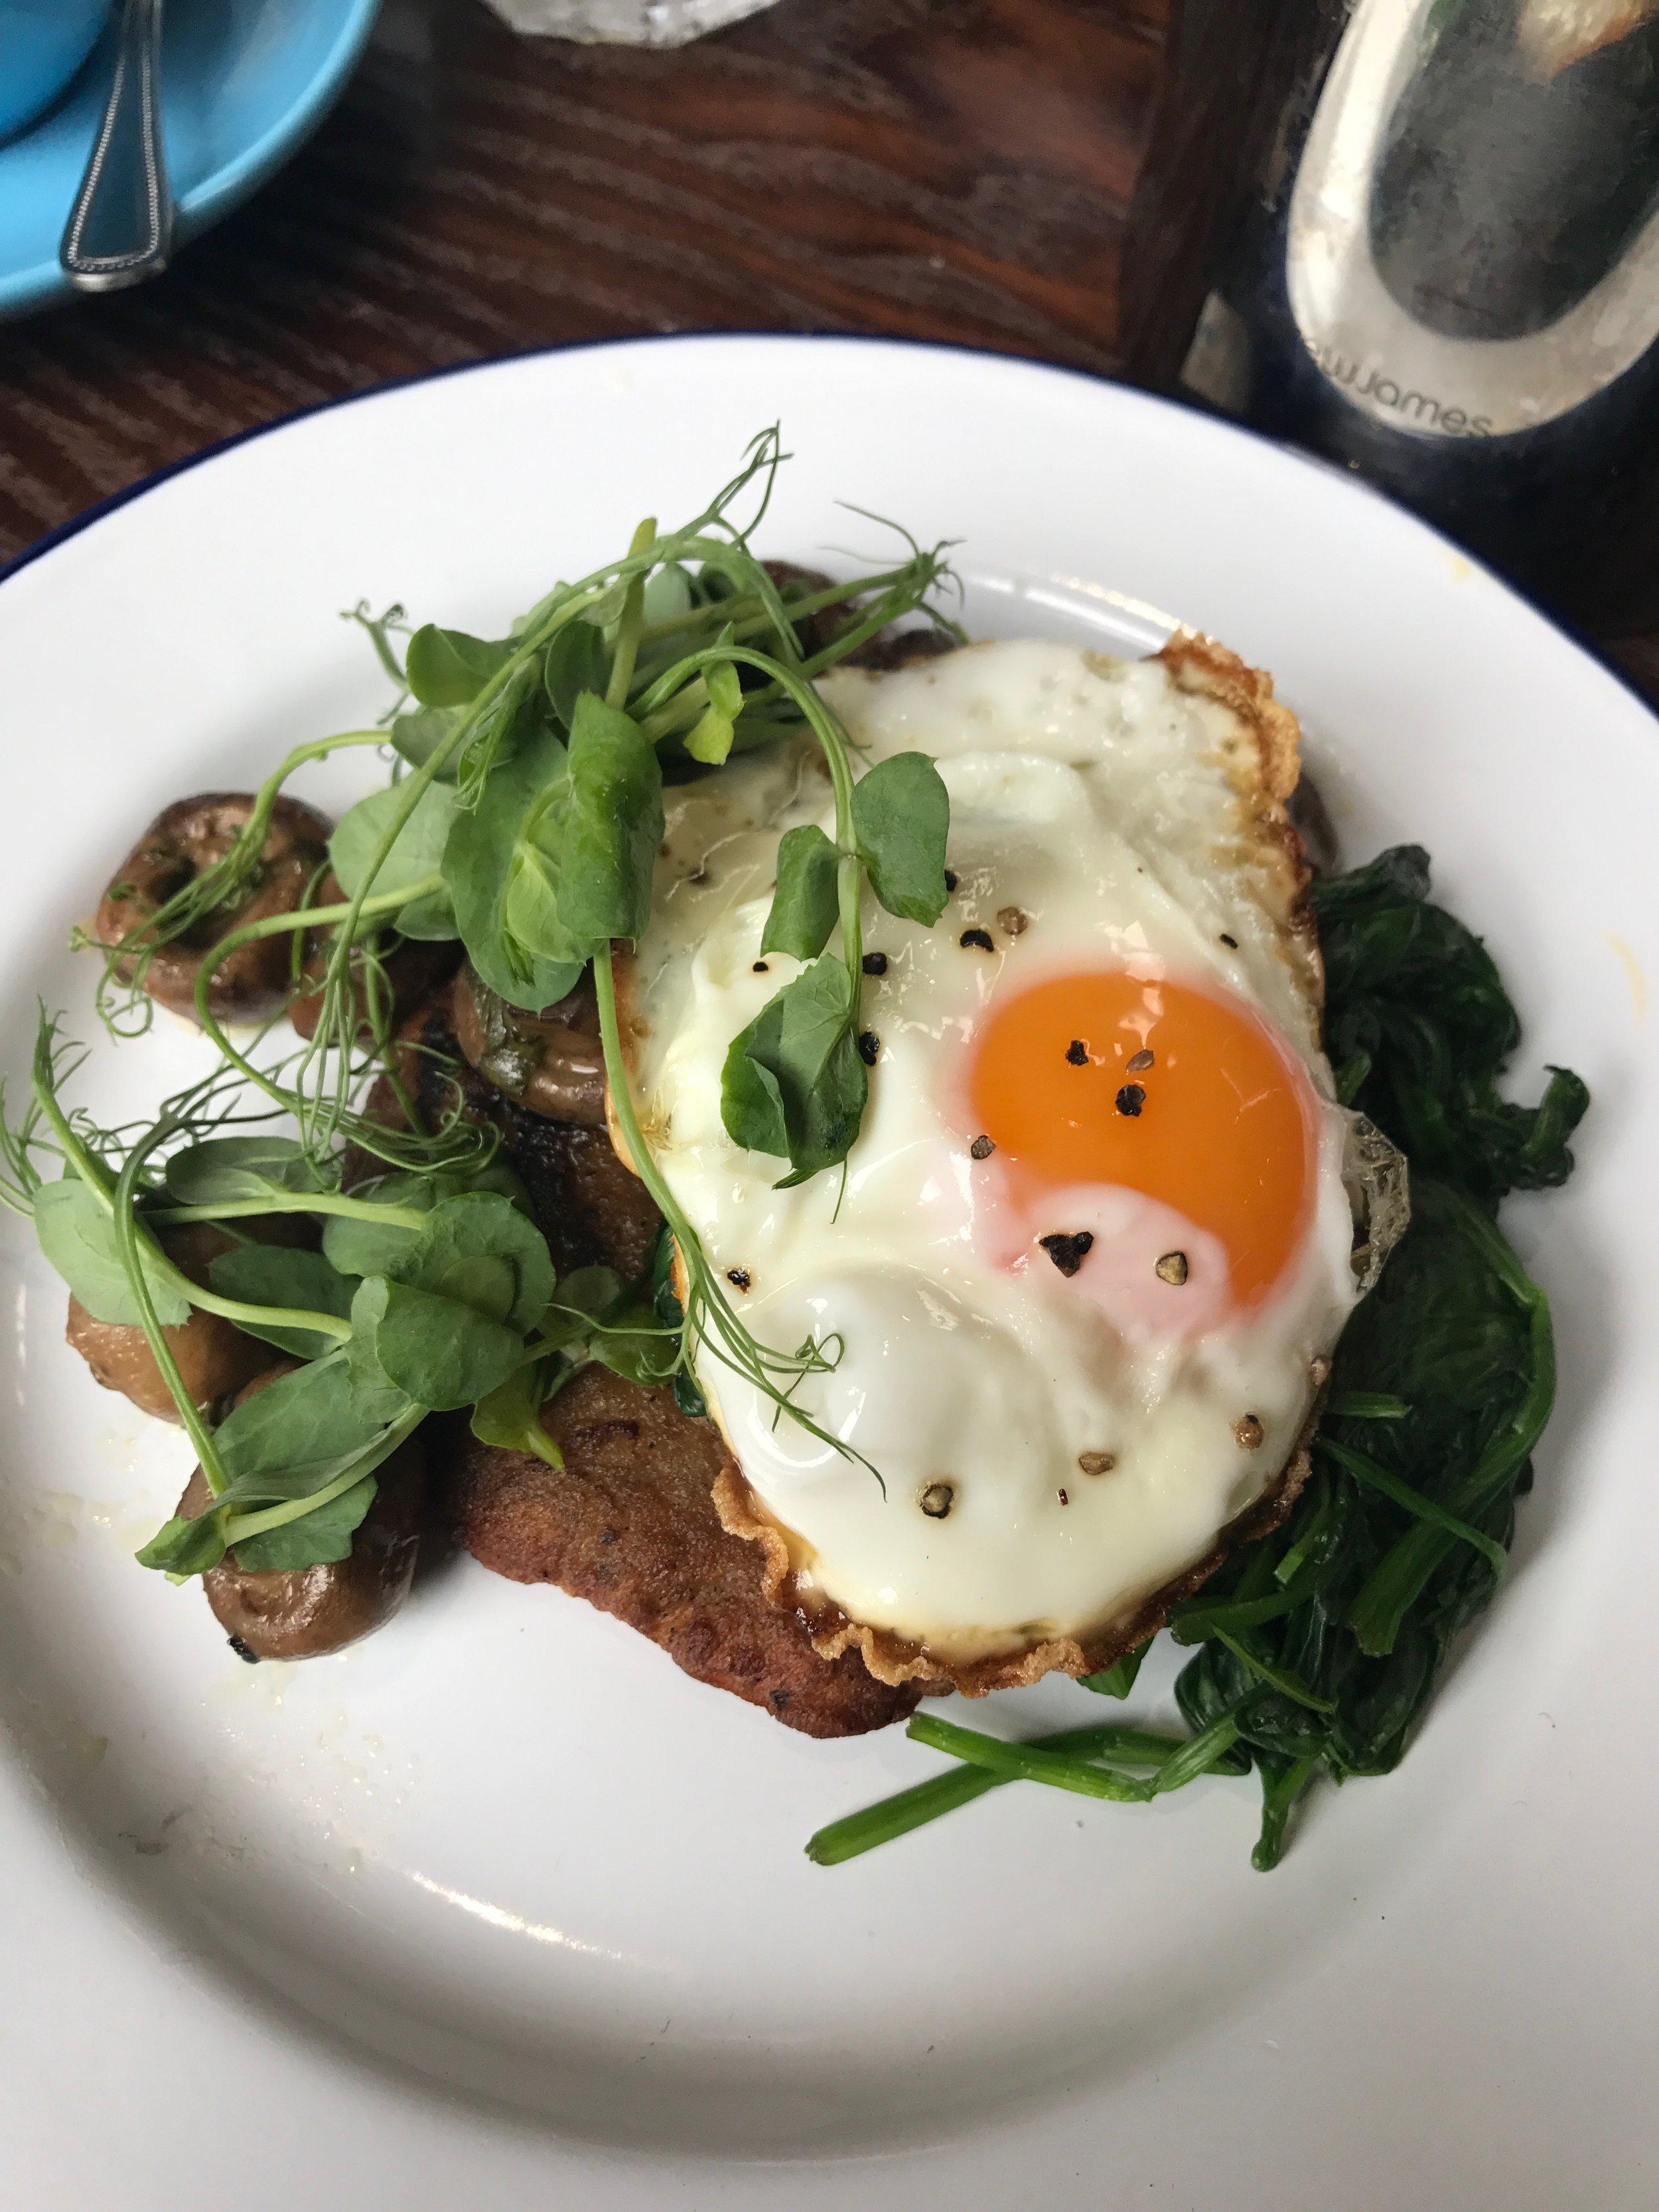 Truffled tattie scone, roast mushrooms, spinach and fried egg